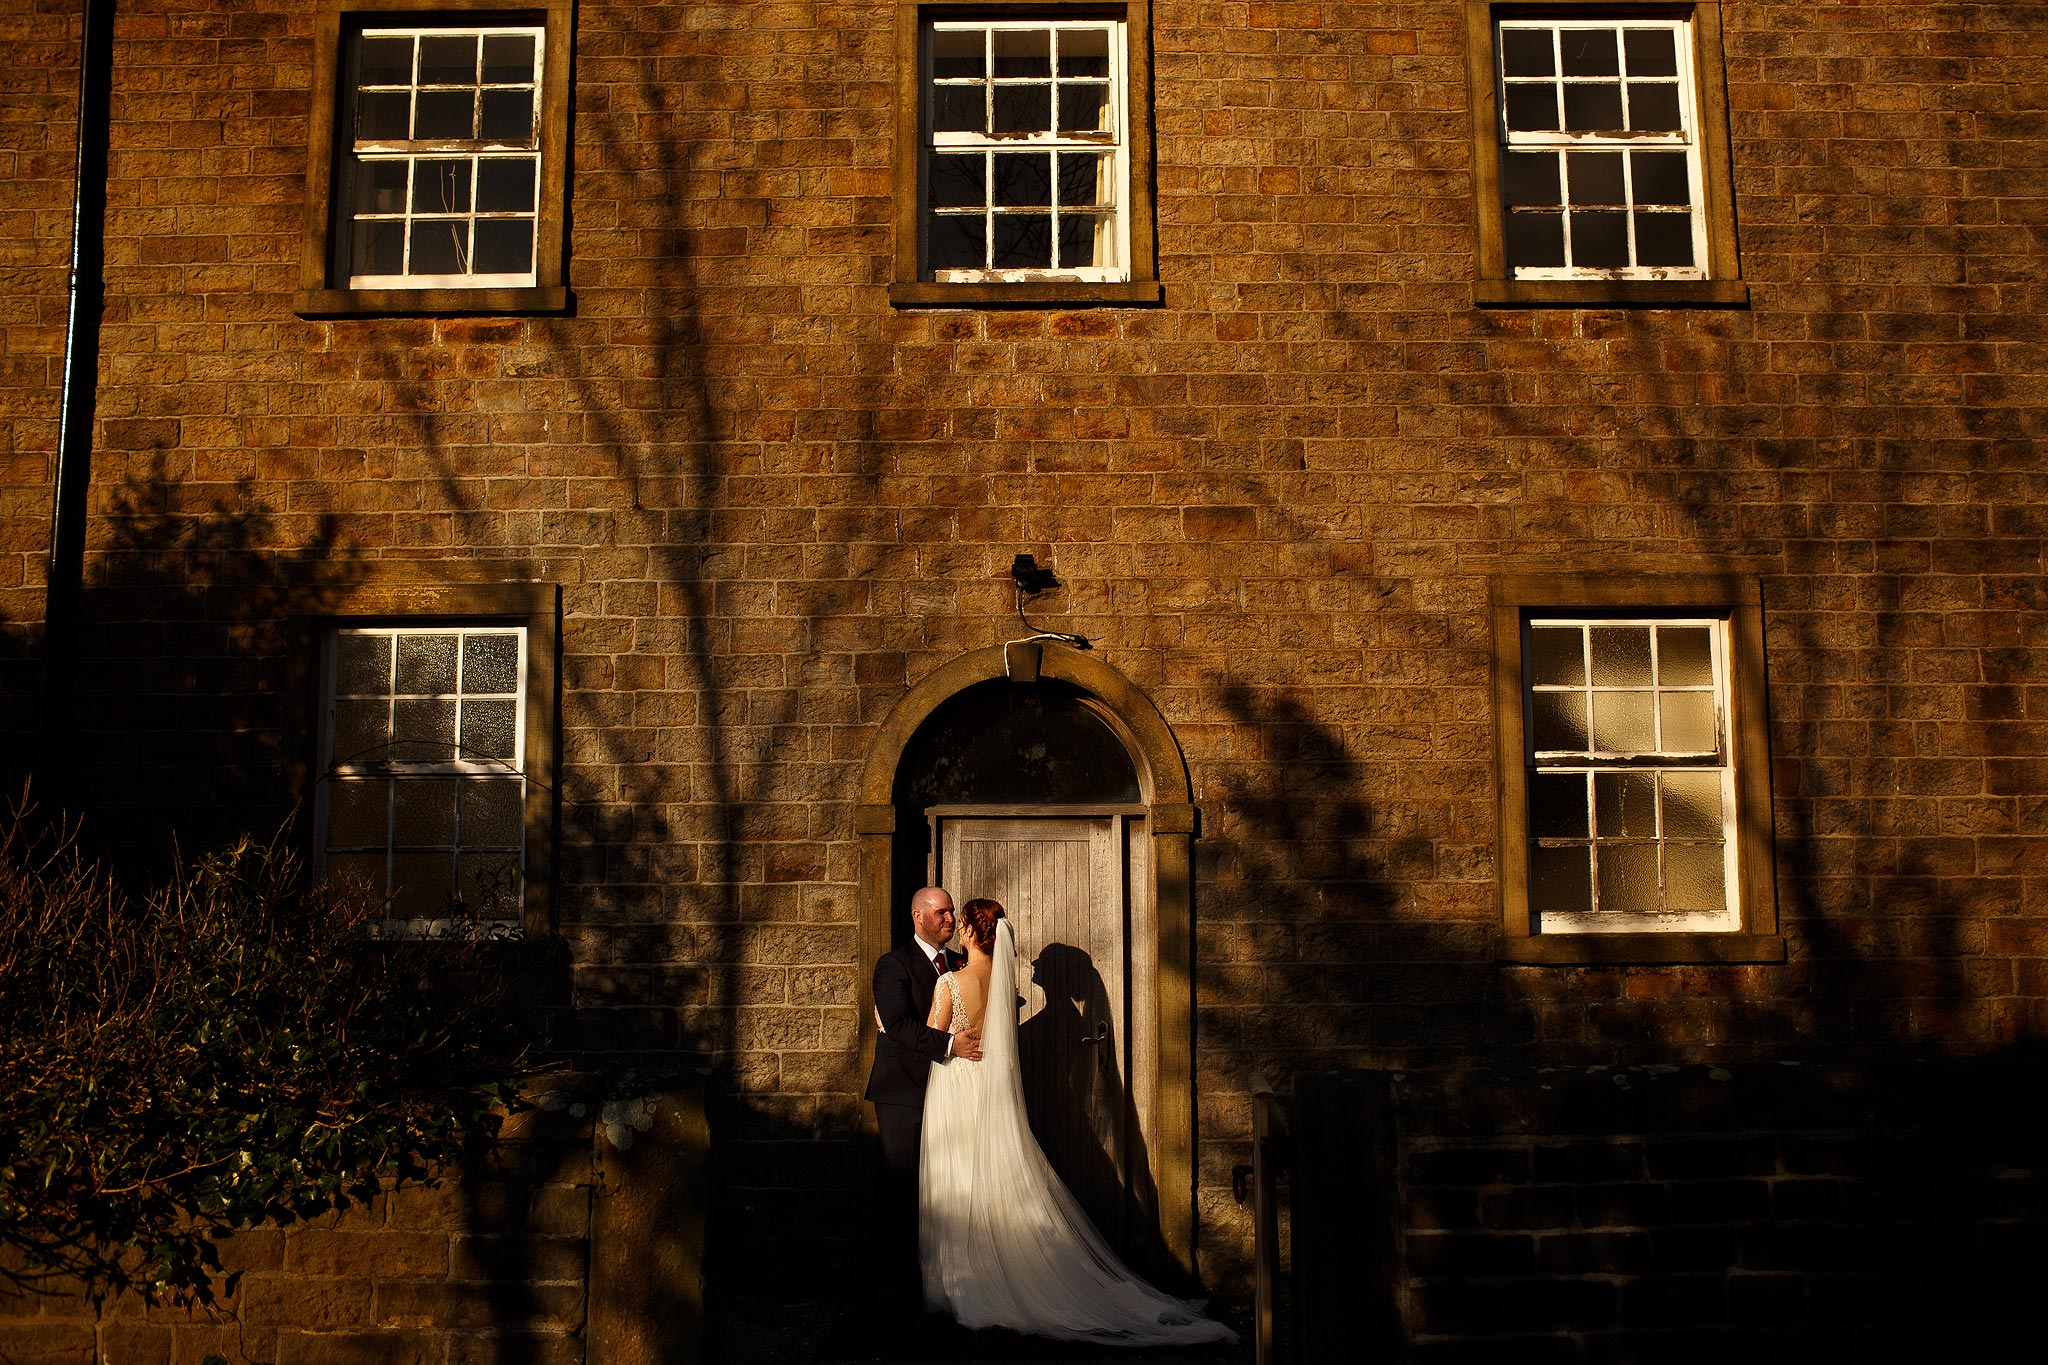 Bride and groom wedding portraits in Downham